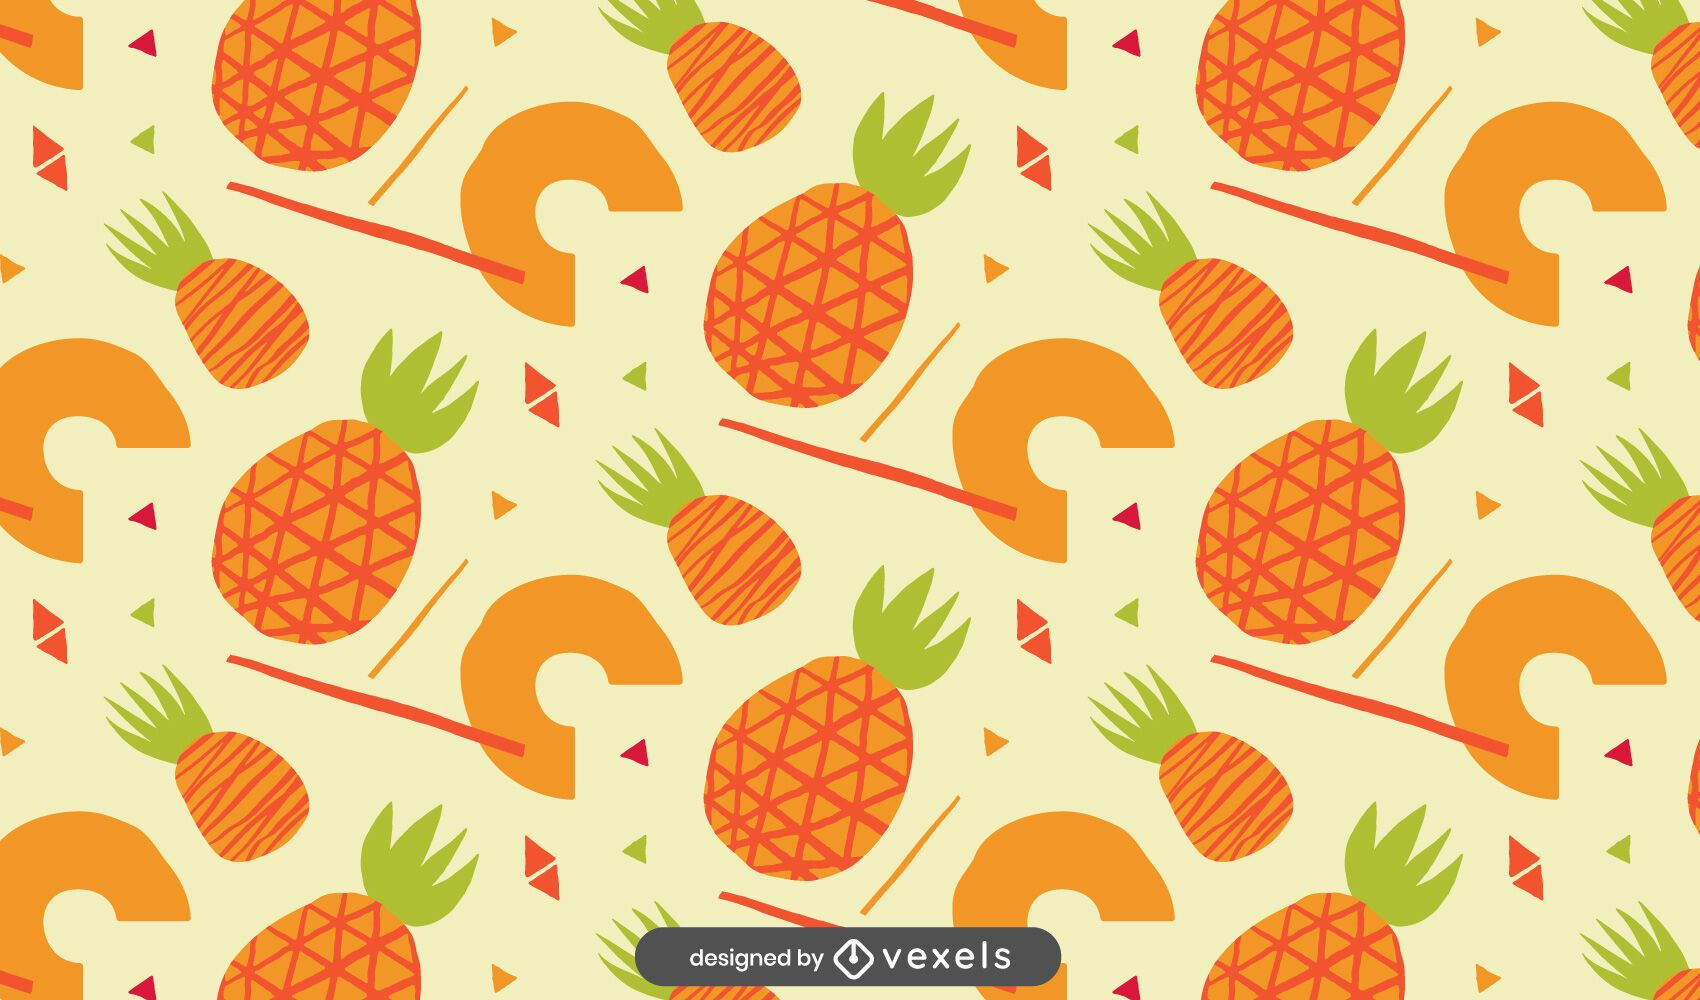 Pineapple pattern design